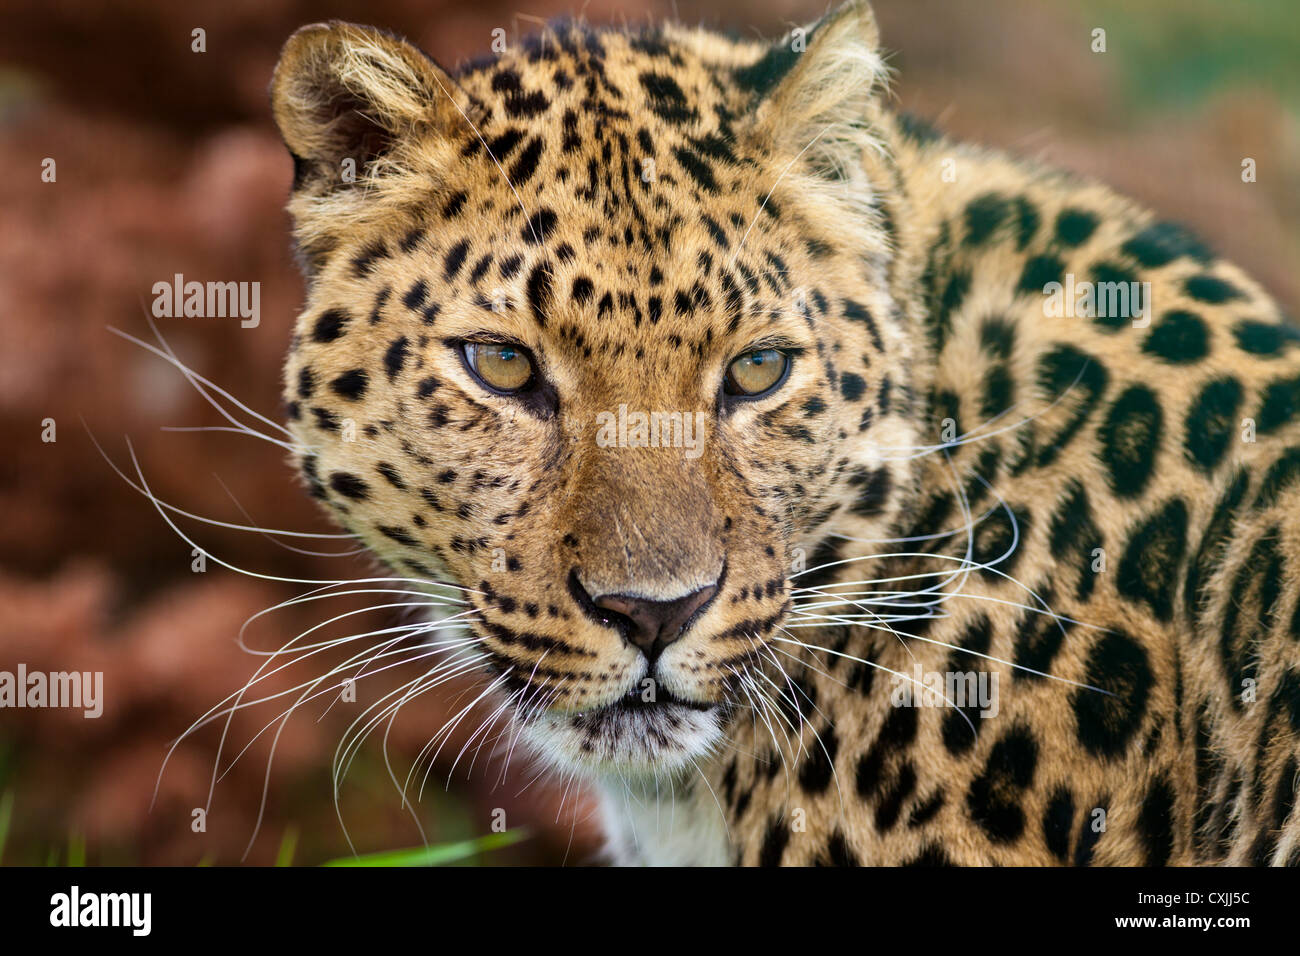 Amur leopard (Panthera pardus) Stock Photo